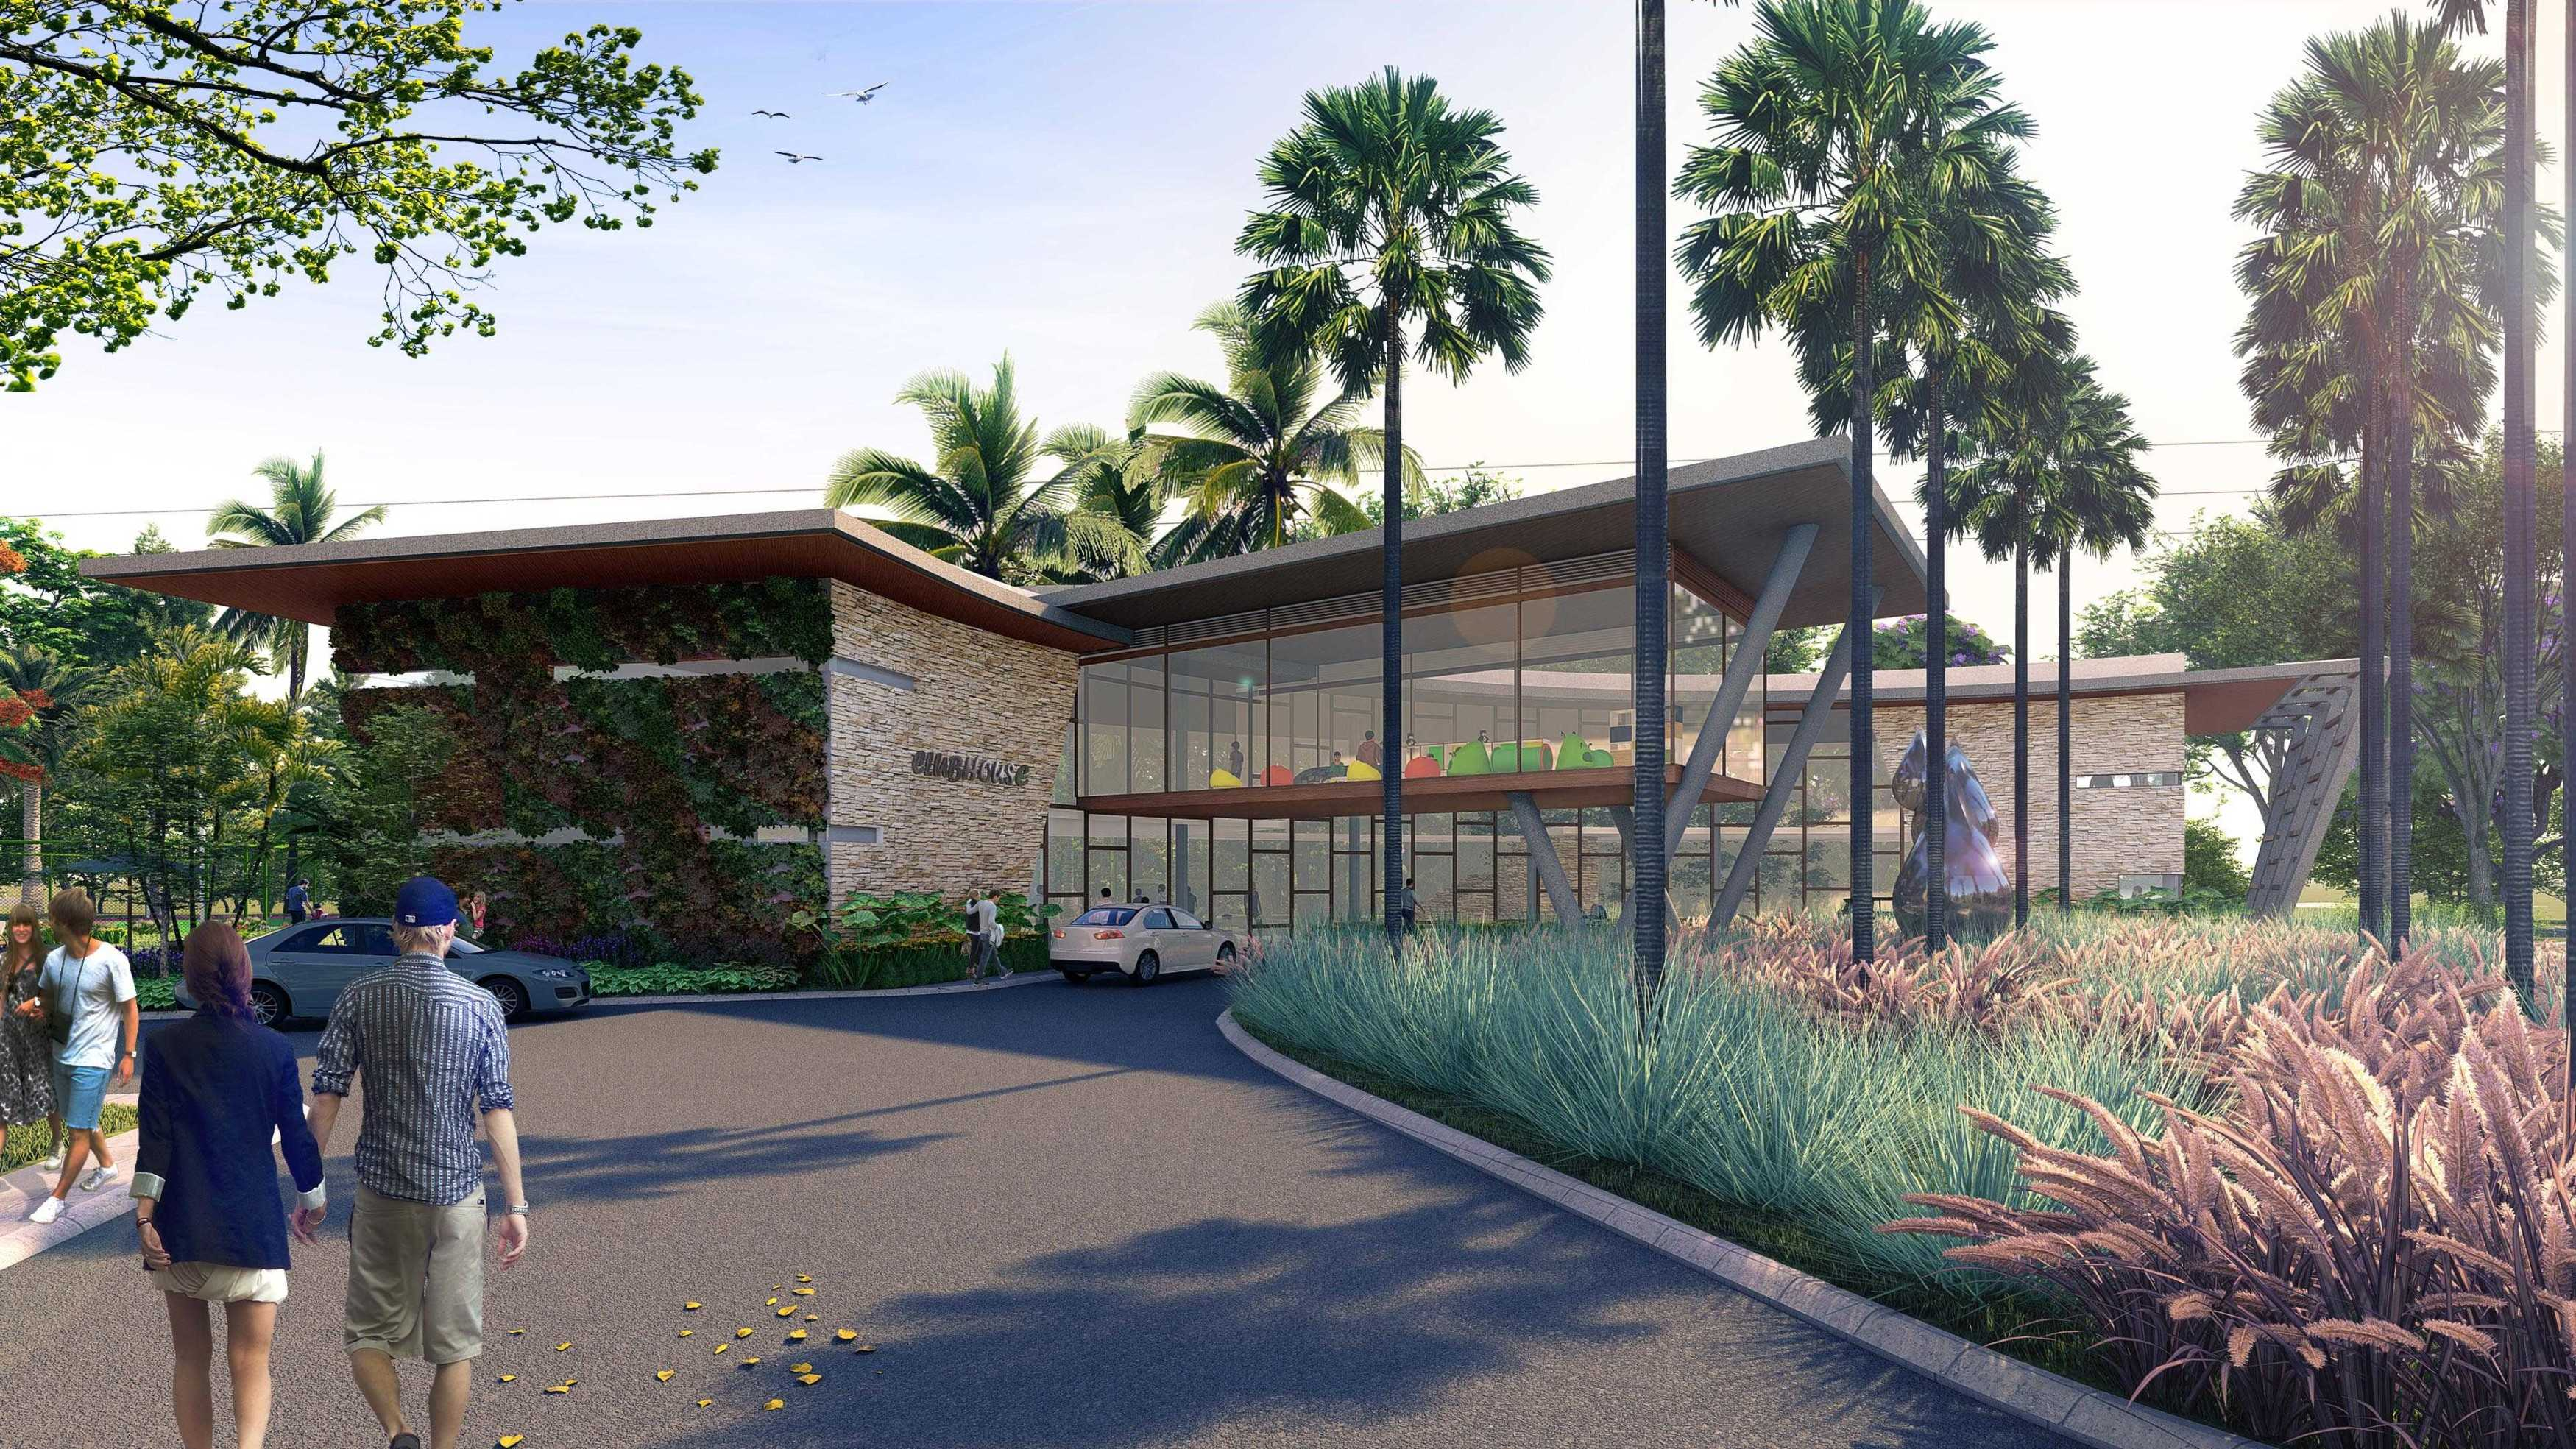 Ambience Design Studio Graha Hijau 5 Clubhouse Ciputat, Kota Tangerang Selatan, Banten, Indonesia Ciputat, Kota Tangerang Selatan, Banten, Indonesia Ambience-Design-Studio-Graha-Hijau-5-Clubhouse   56903